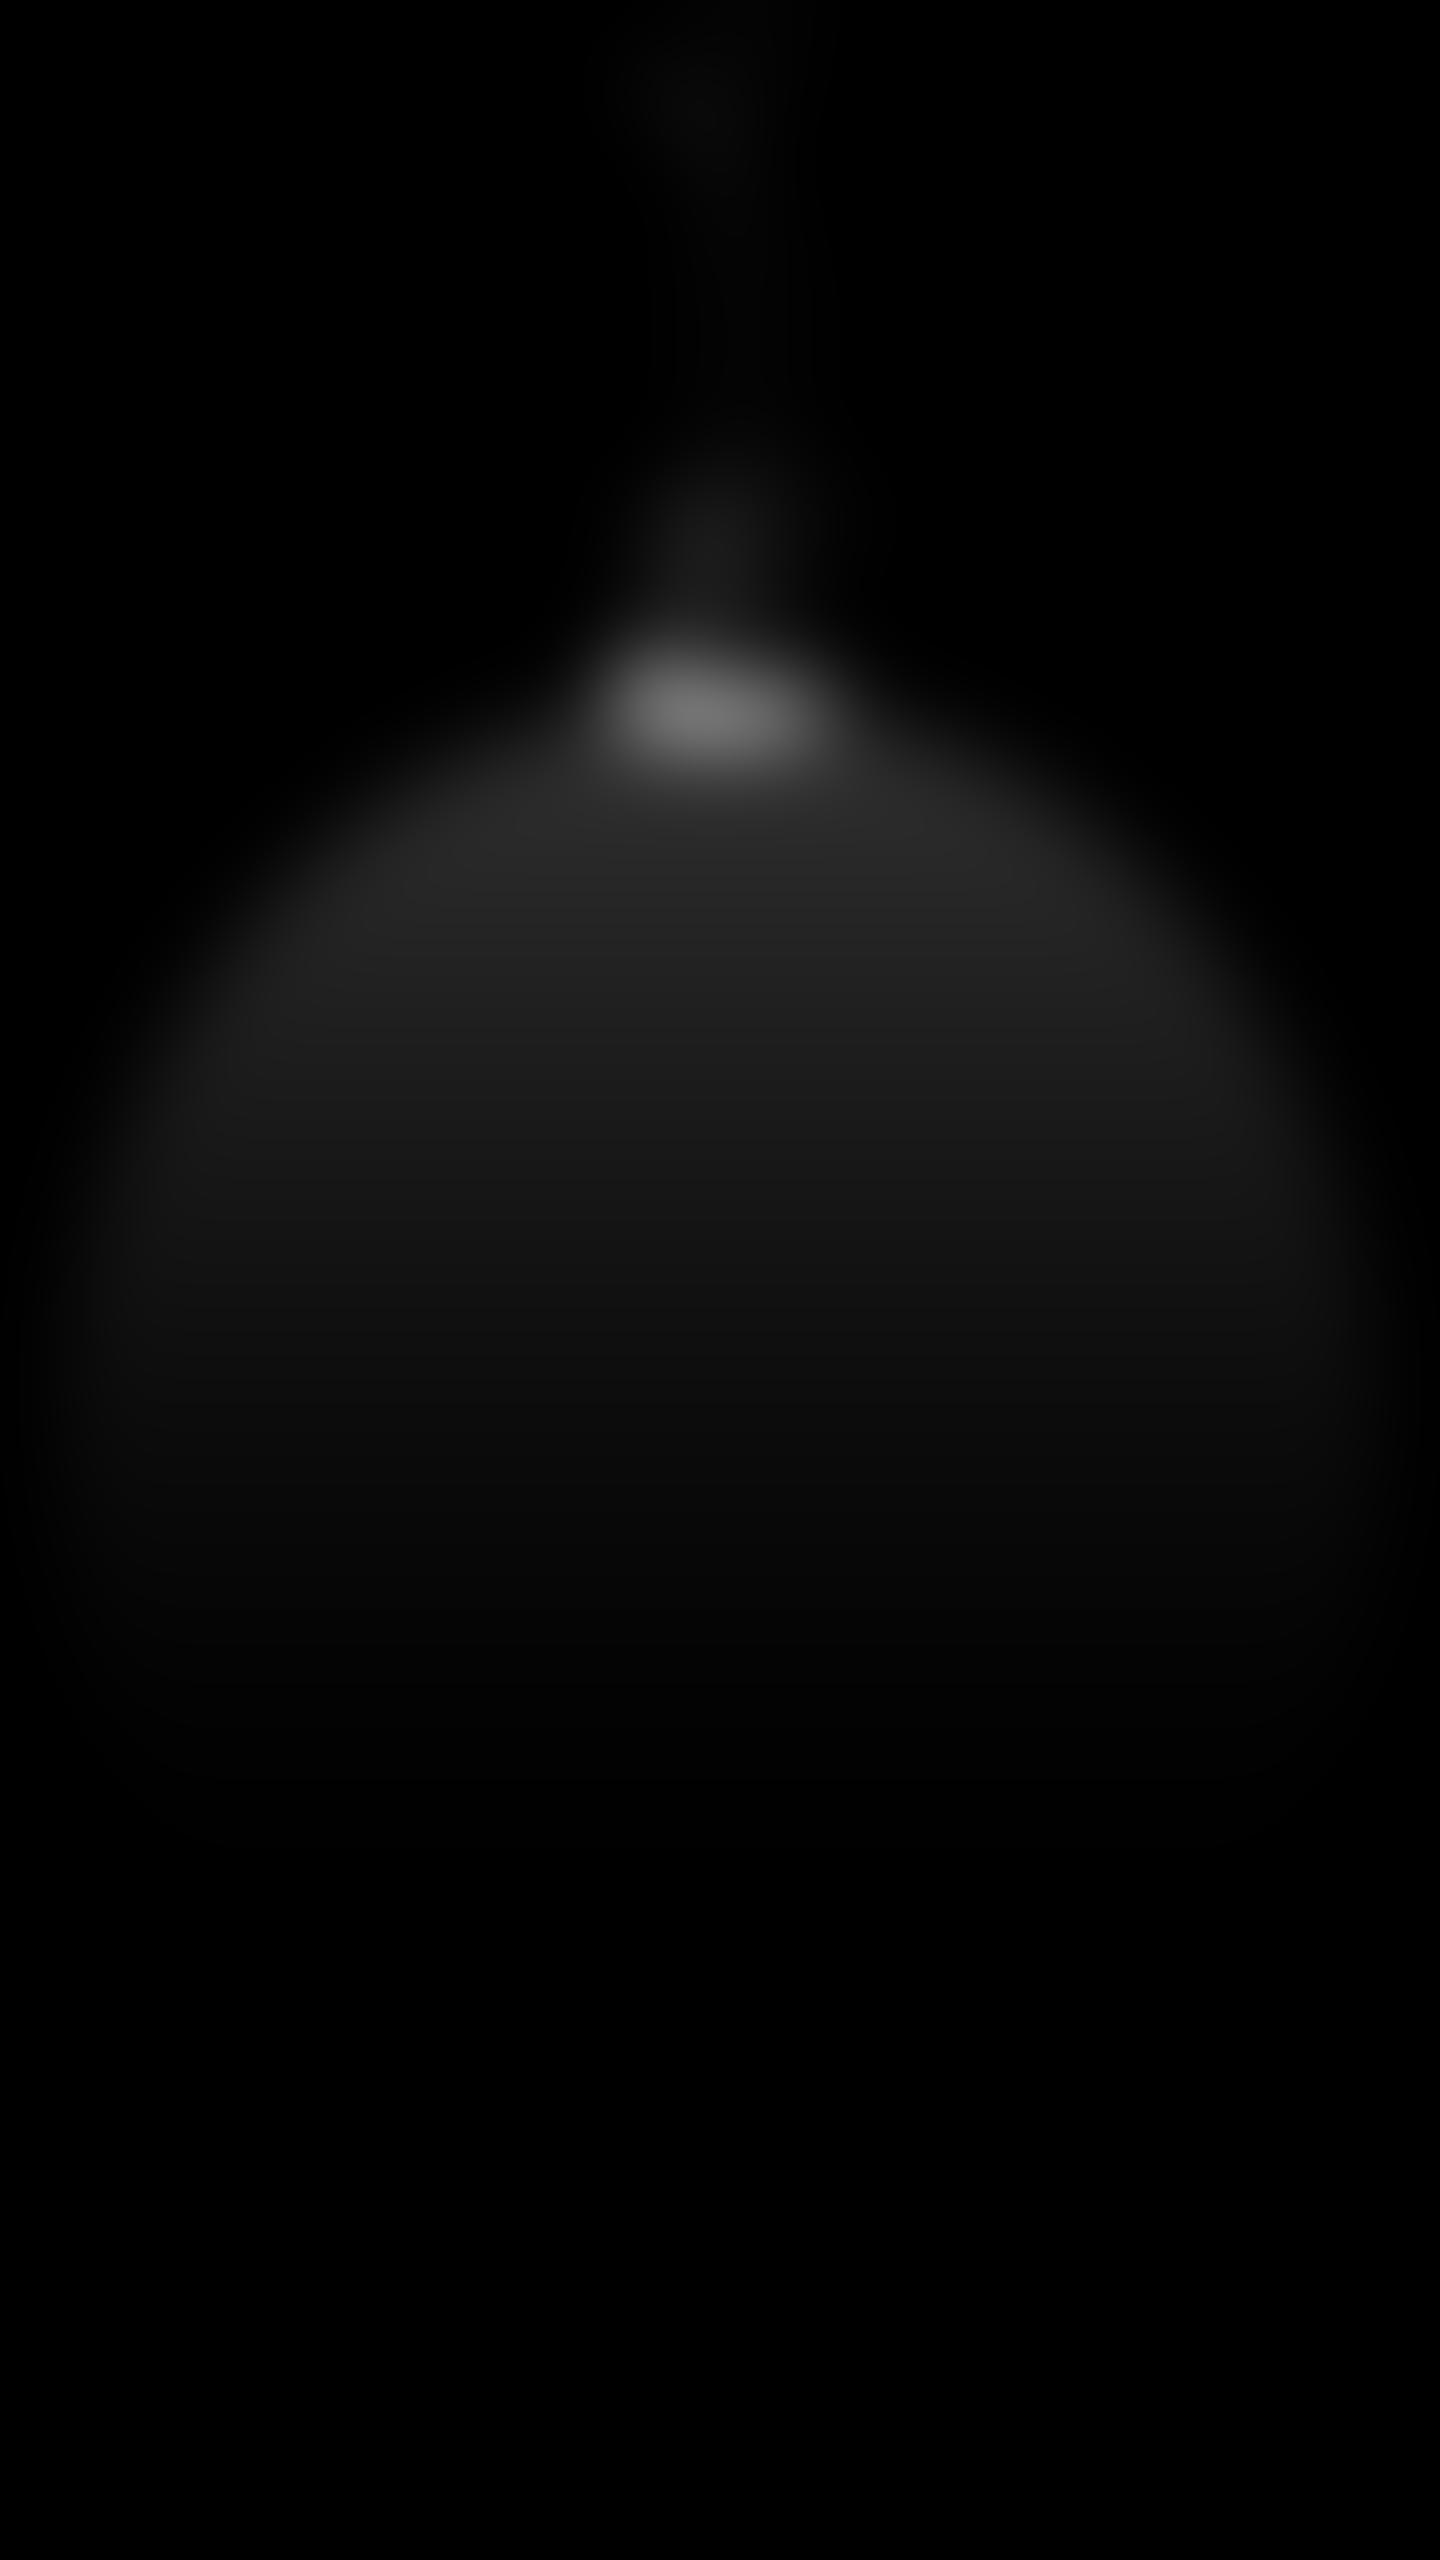 【v粉壁纸】极简线条]简约风格 适合黑色边框